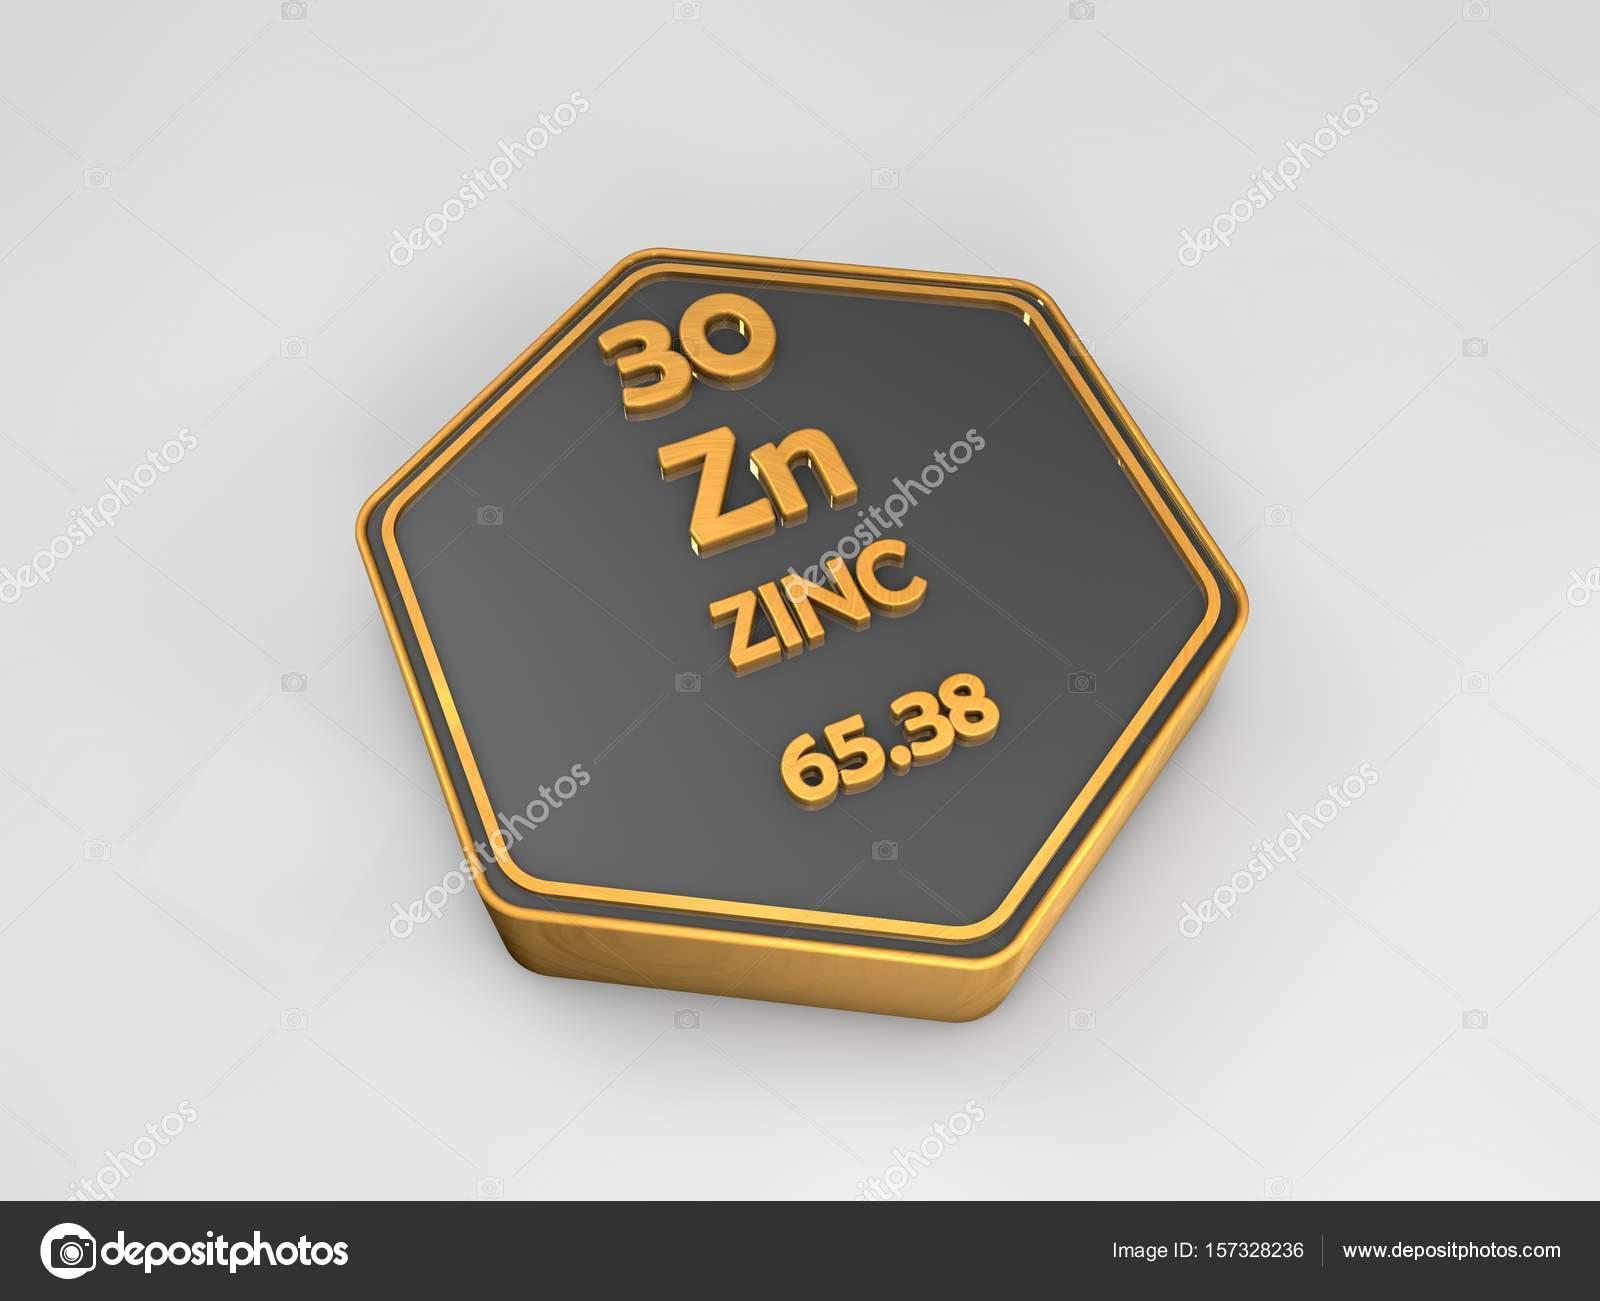 Zinc zn elemento qumico tabla peridica forma hexagonal 3d zinc zn elemento qumico tabla peridica forma hexagonal 3d render fotos de stock urtaz Images